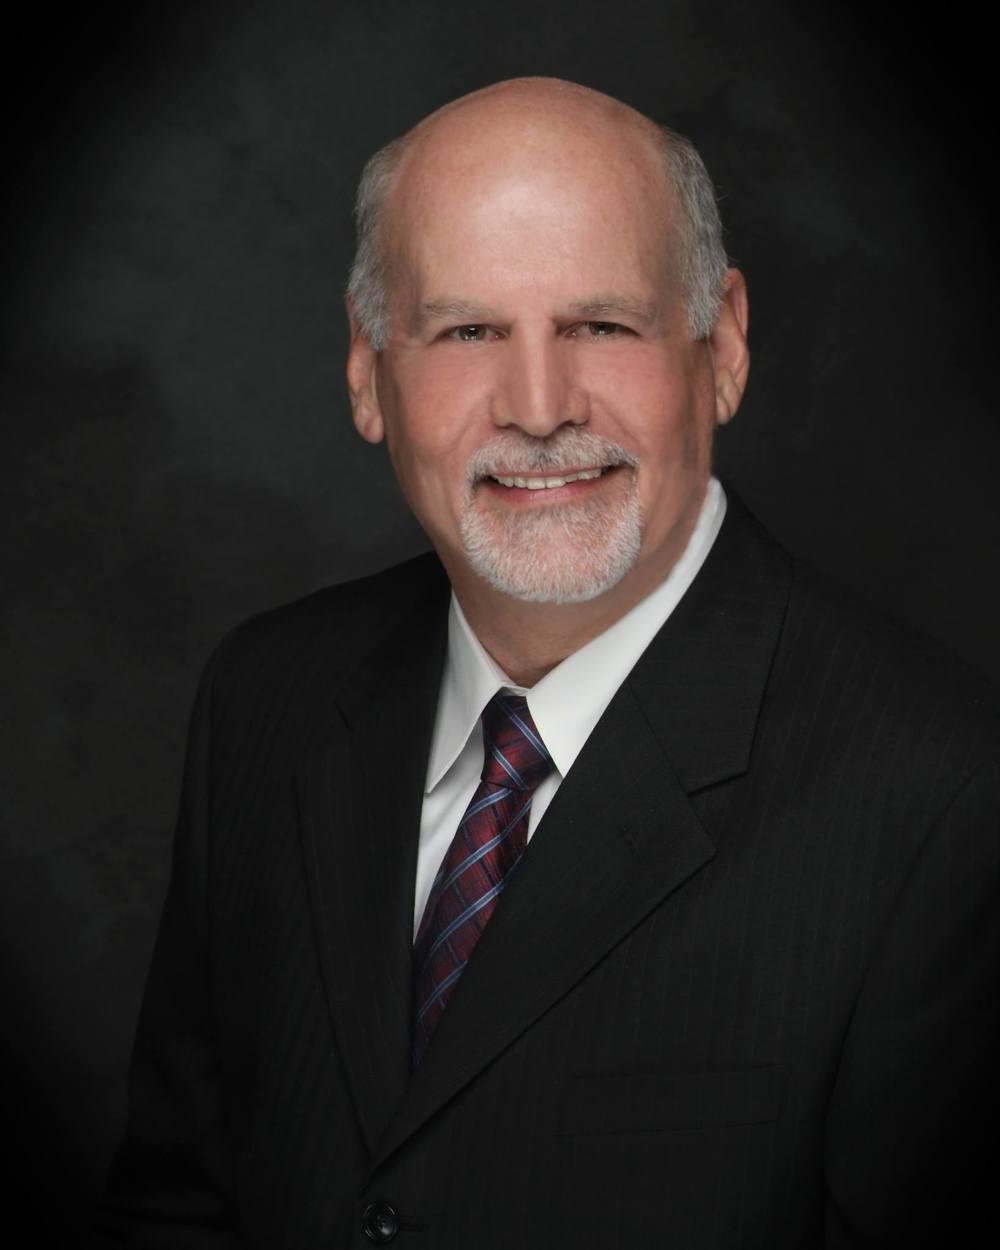 Dr. Michael J. Kobel